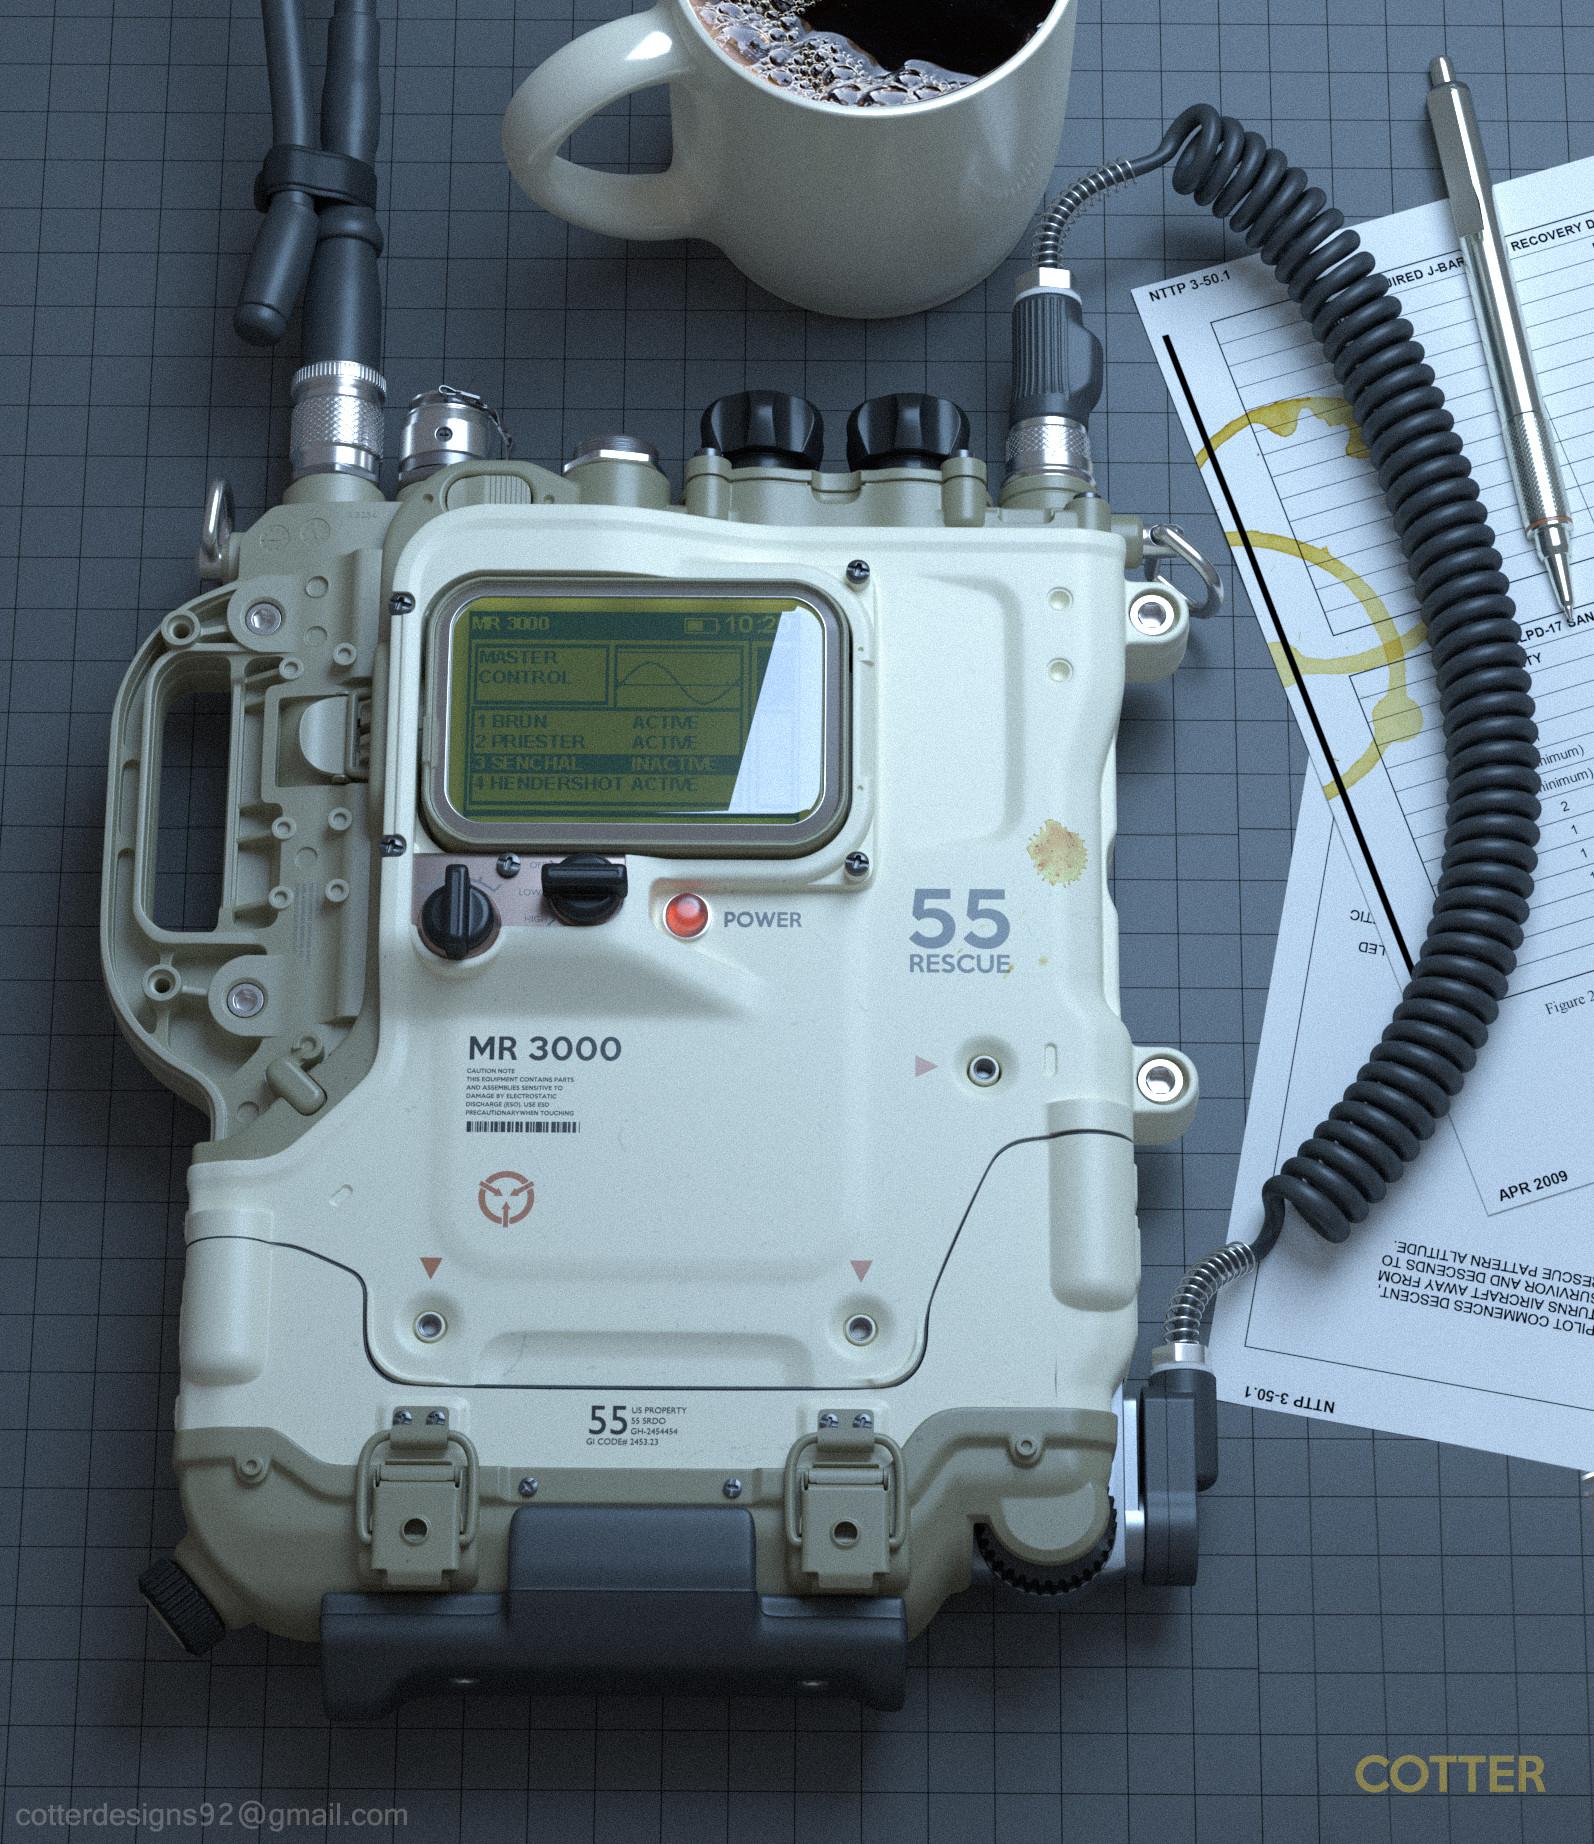 joshua-cotter-radio-secondary.jpg (1594×1844)